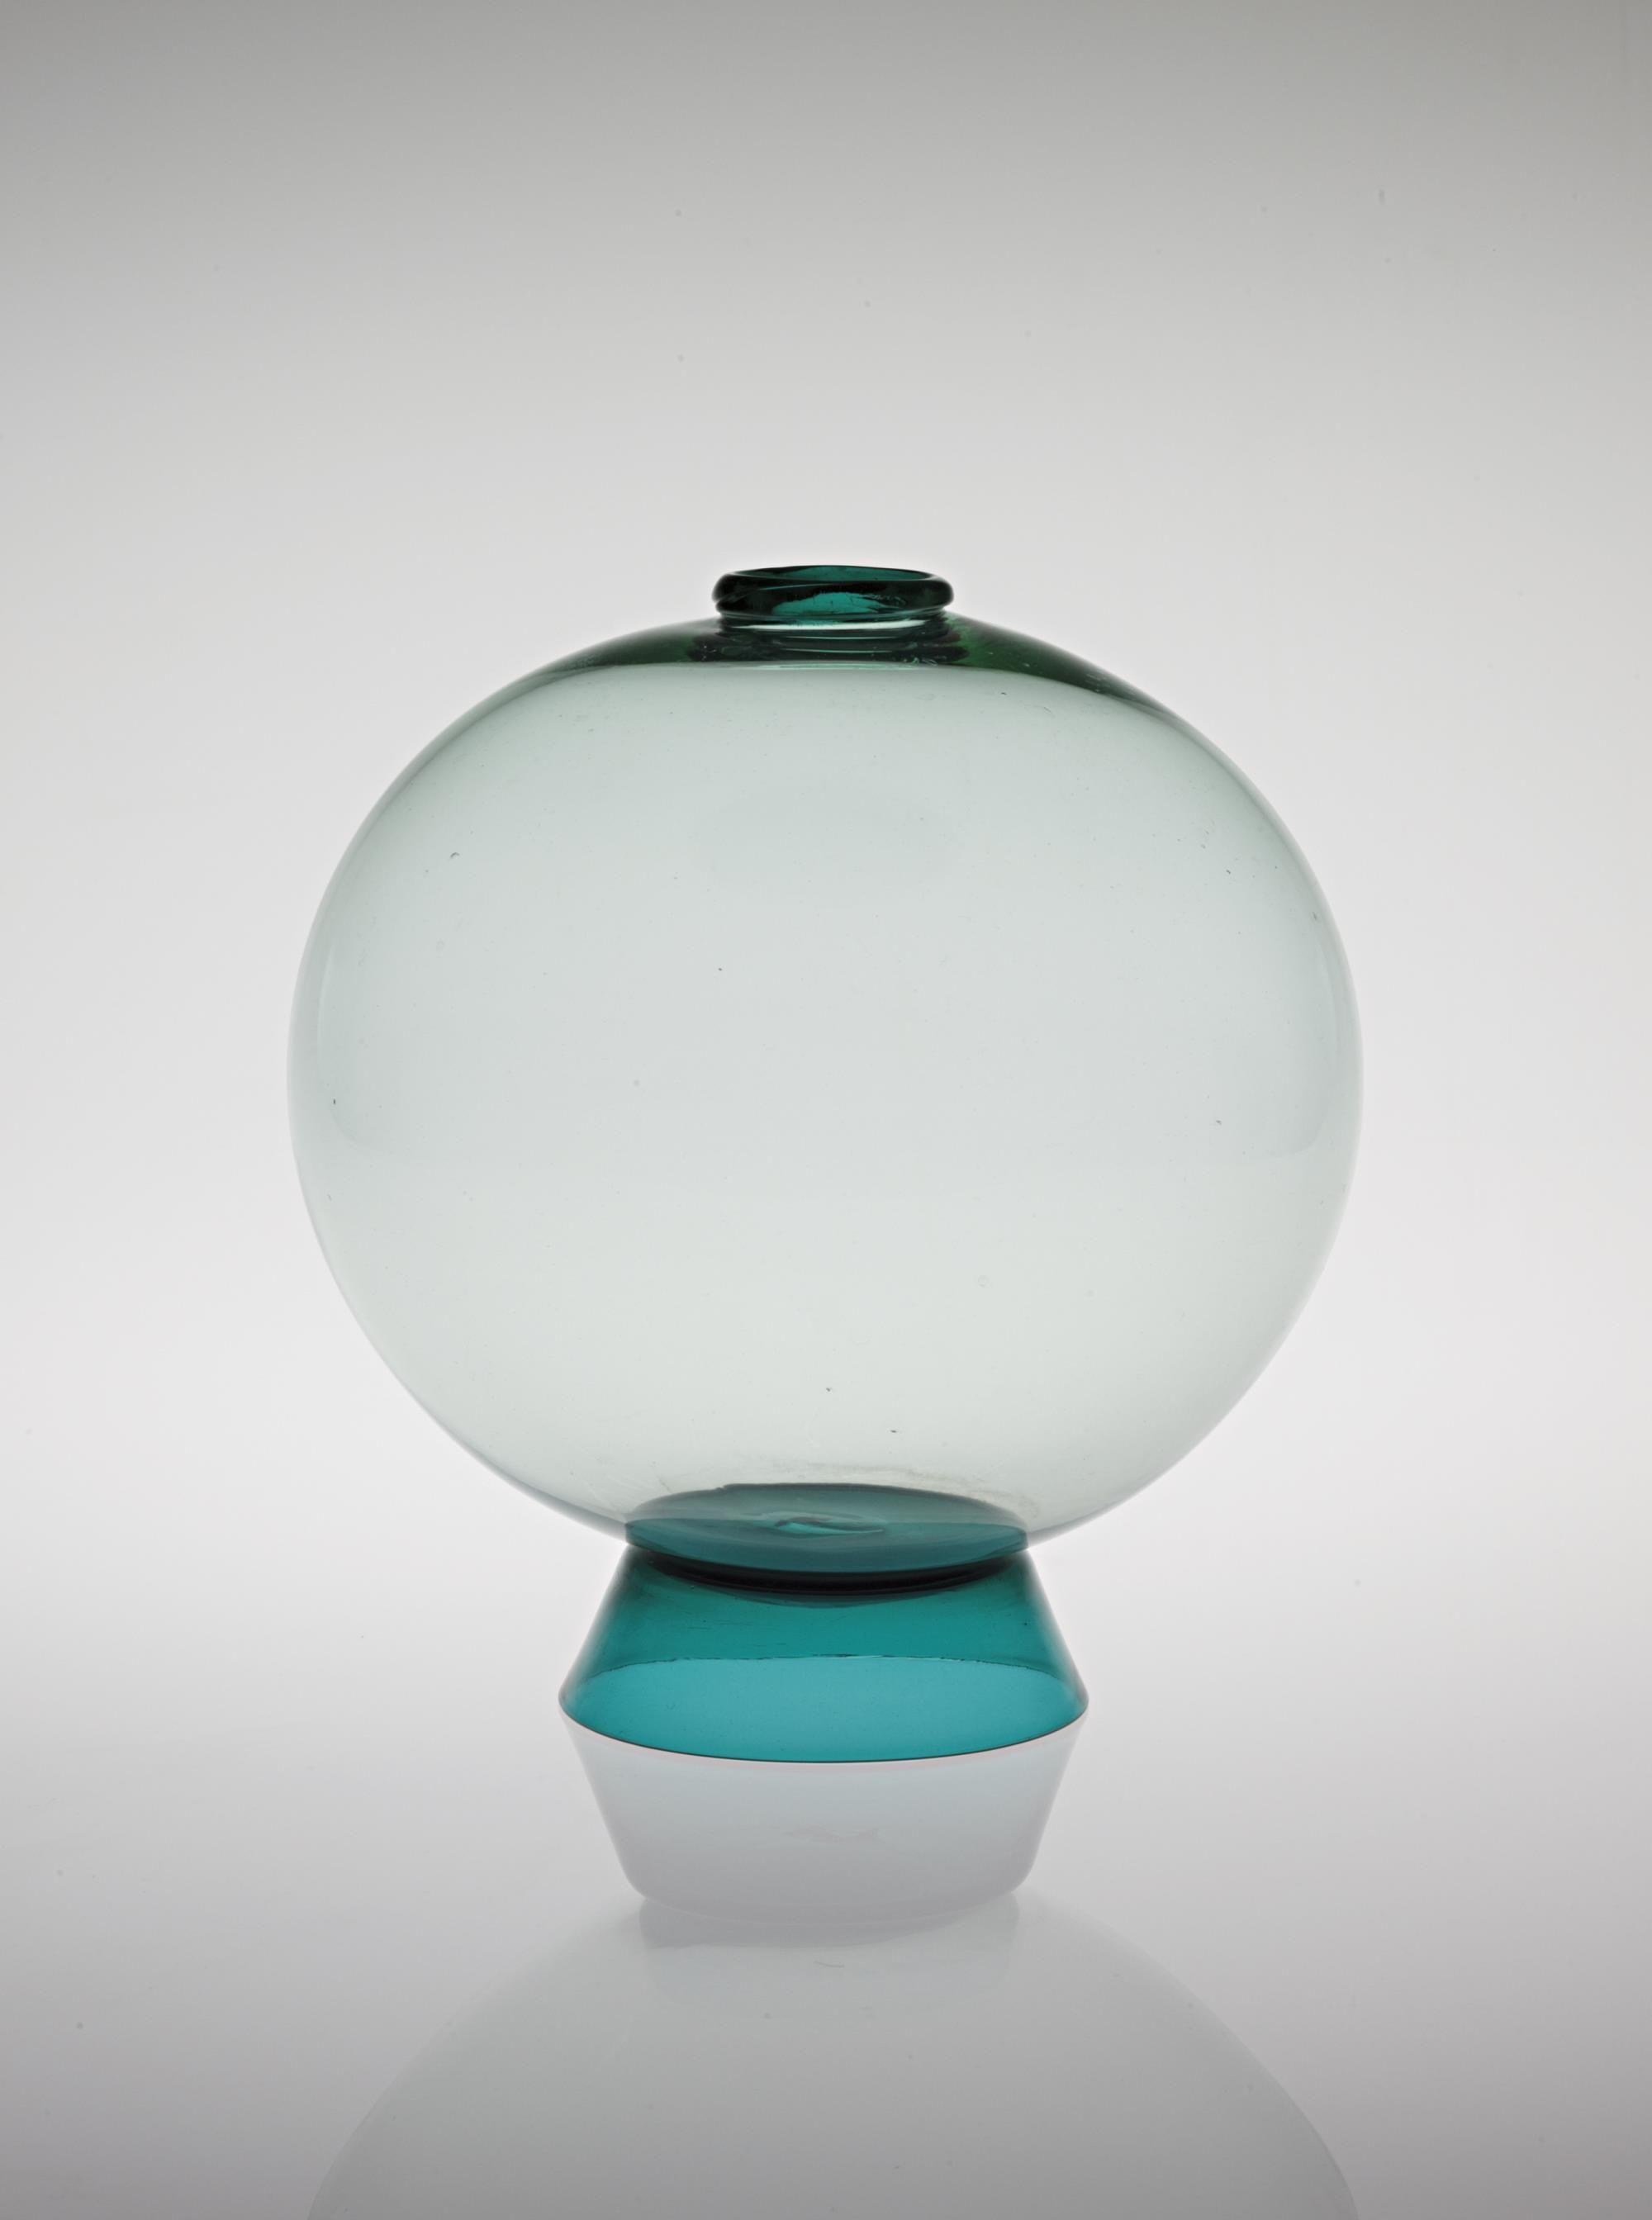 Carlo scarpa vase model no 5673 c 1926 coloured iridescent carlo scarpa vase model no 5673 c 1926 coloured iridescent glass floridaeventfo Image collections